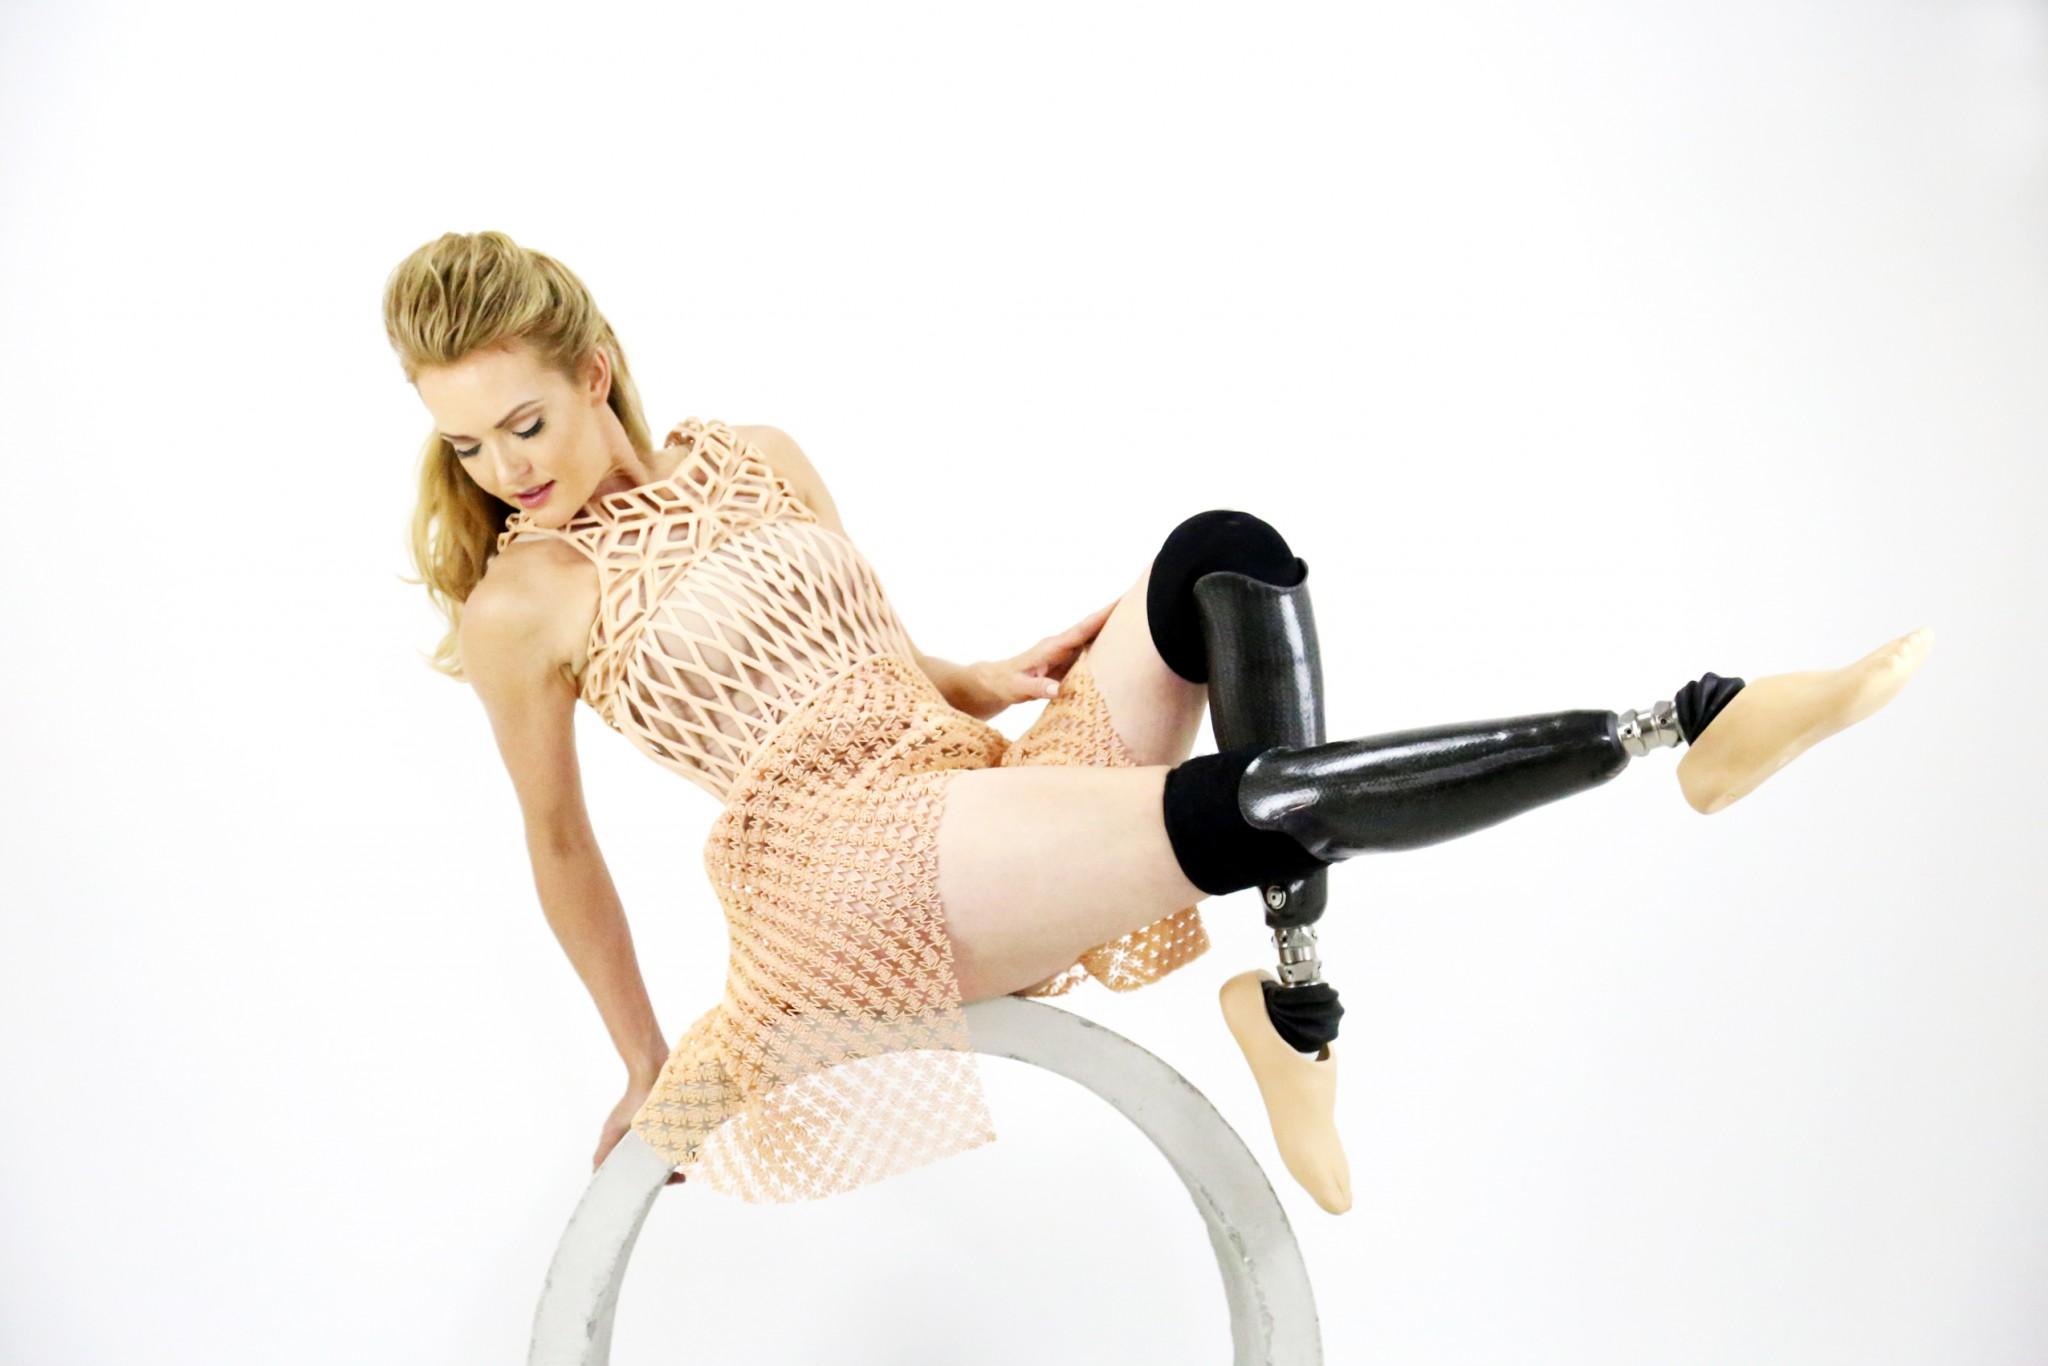 Amy Purdy danced in Israeli designer's 3D-printed dress at Rio Paralympics. Photo by Danit Peleg